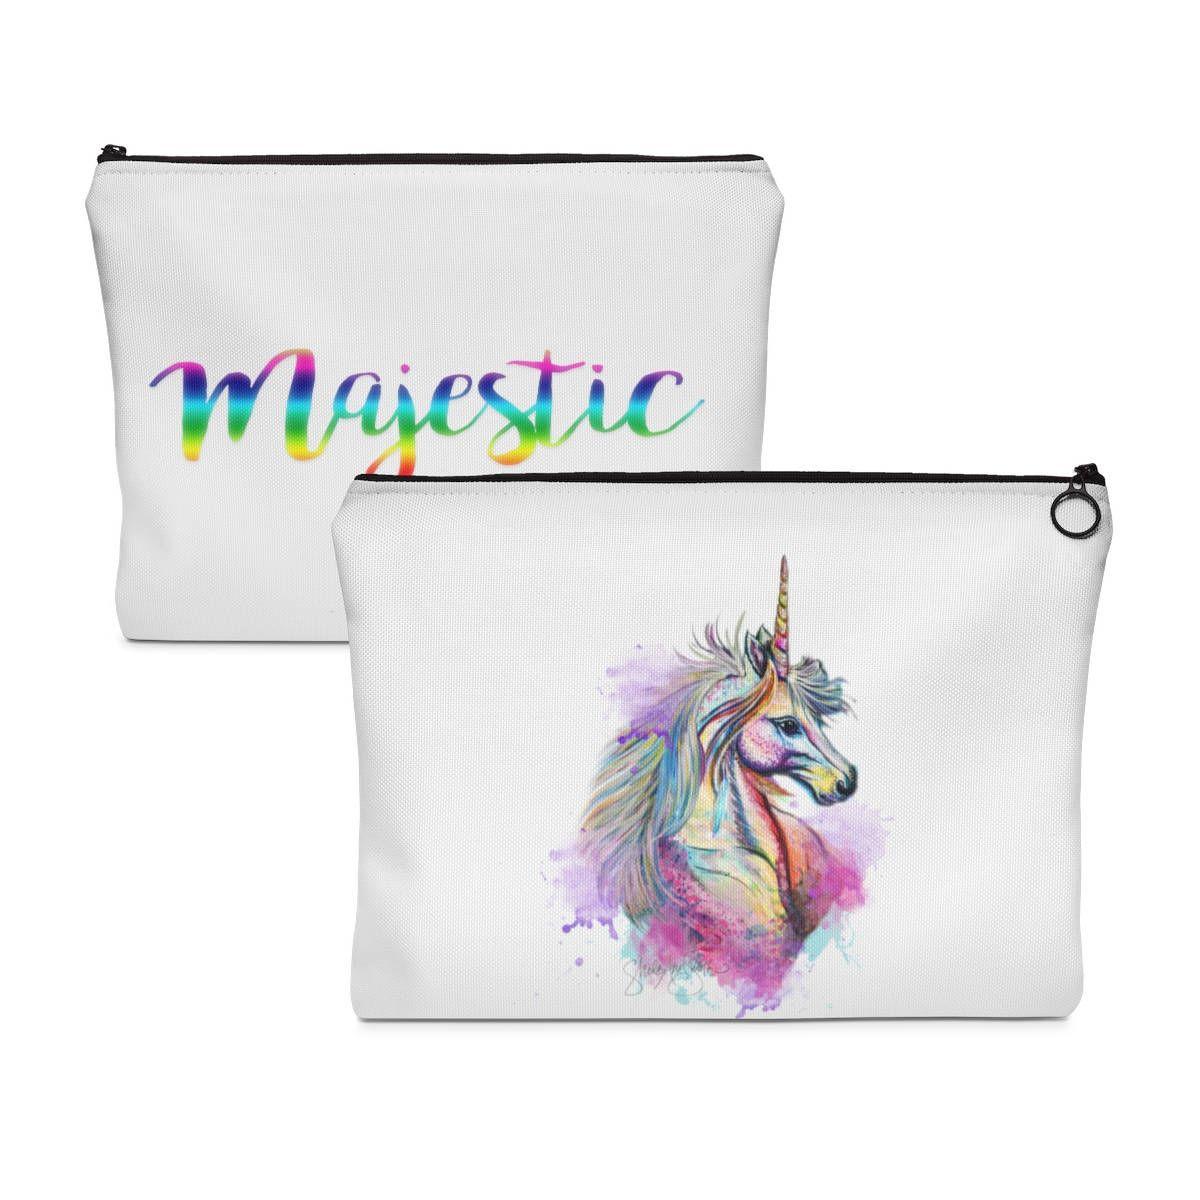 Majestic Unicorn makeup bag, Unicorn Carry All Pouch